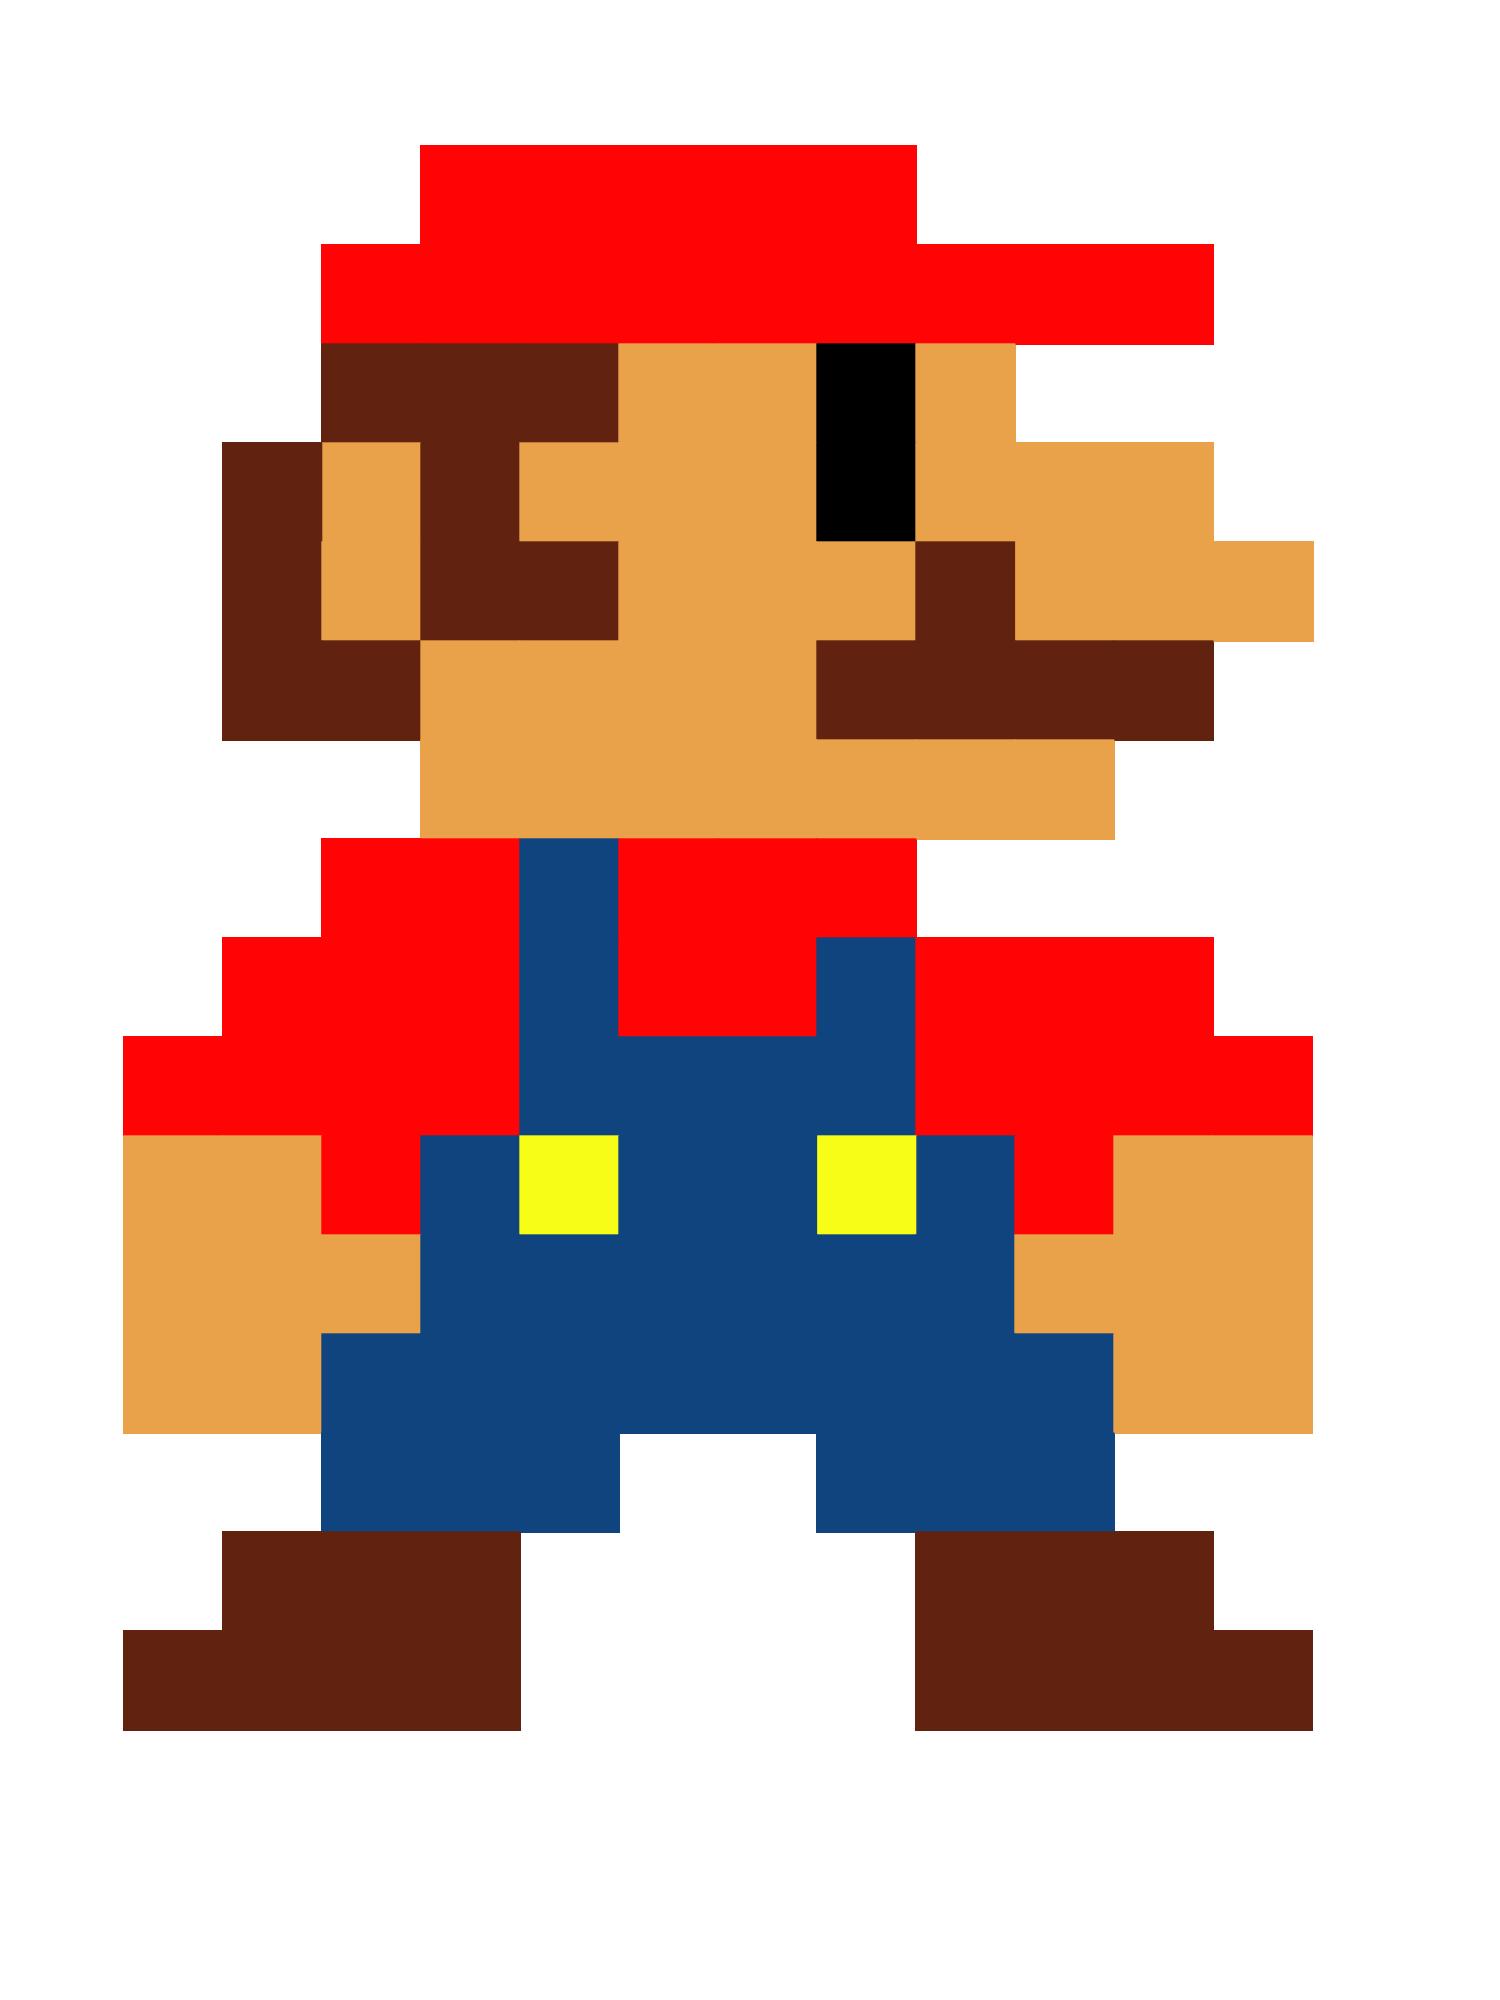 Mario clipart ground, Mario ground Transparent FREE for.